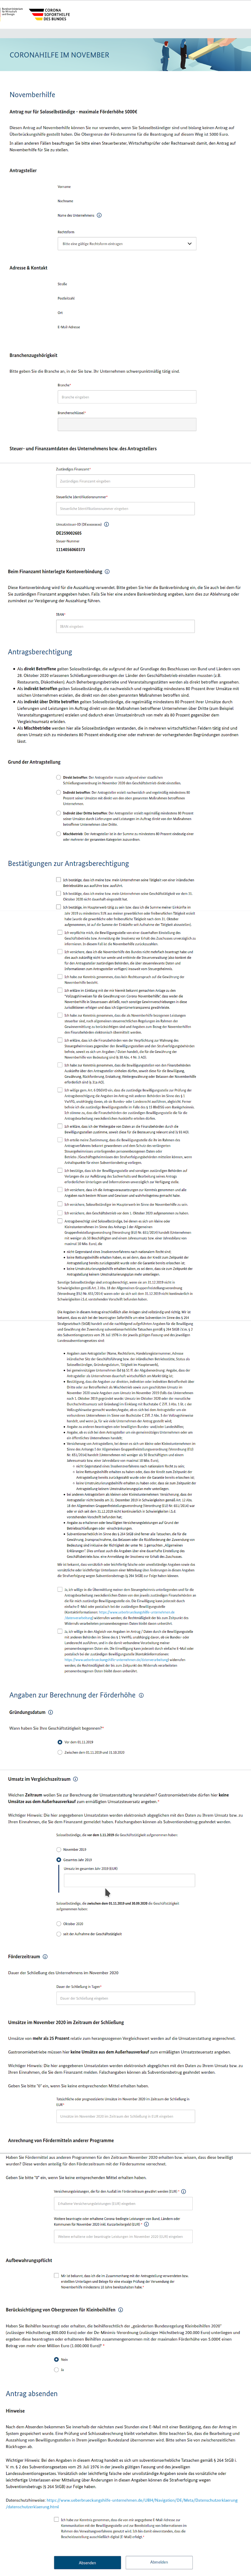 Novemberhilfe = eGovernance: Antrag auf novemberhilfe 2020